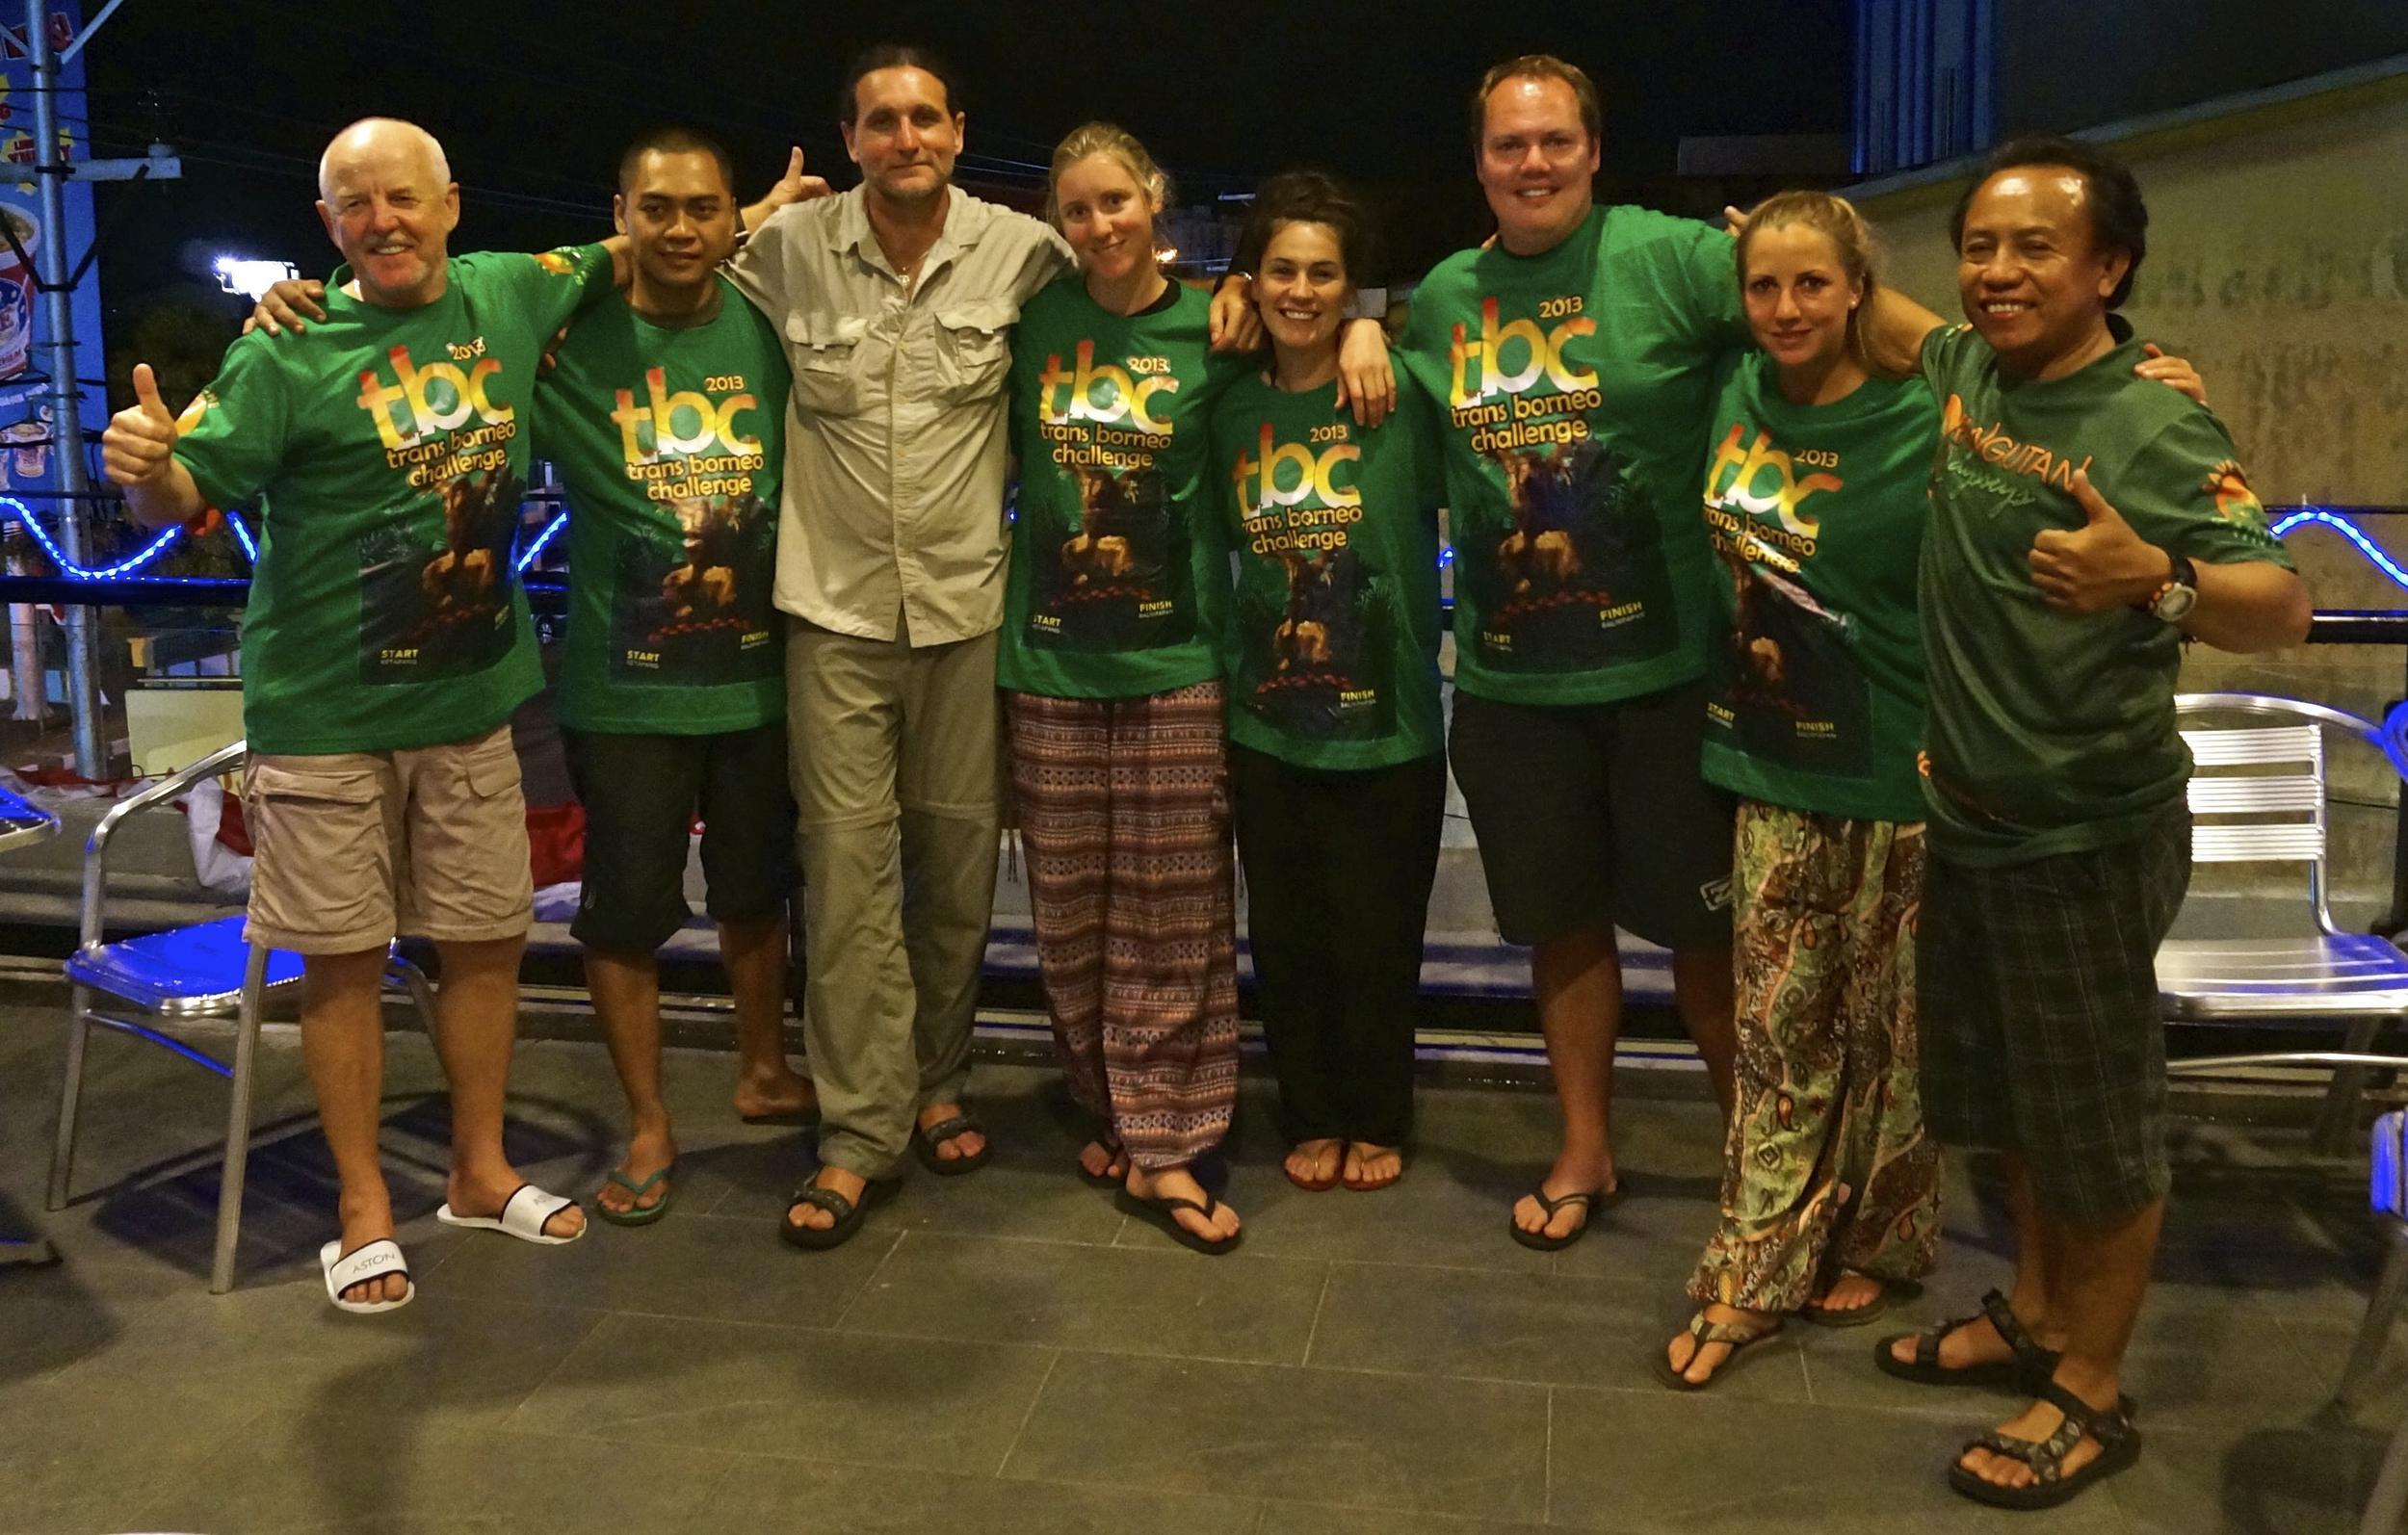 Team Trans Borneo Challenge